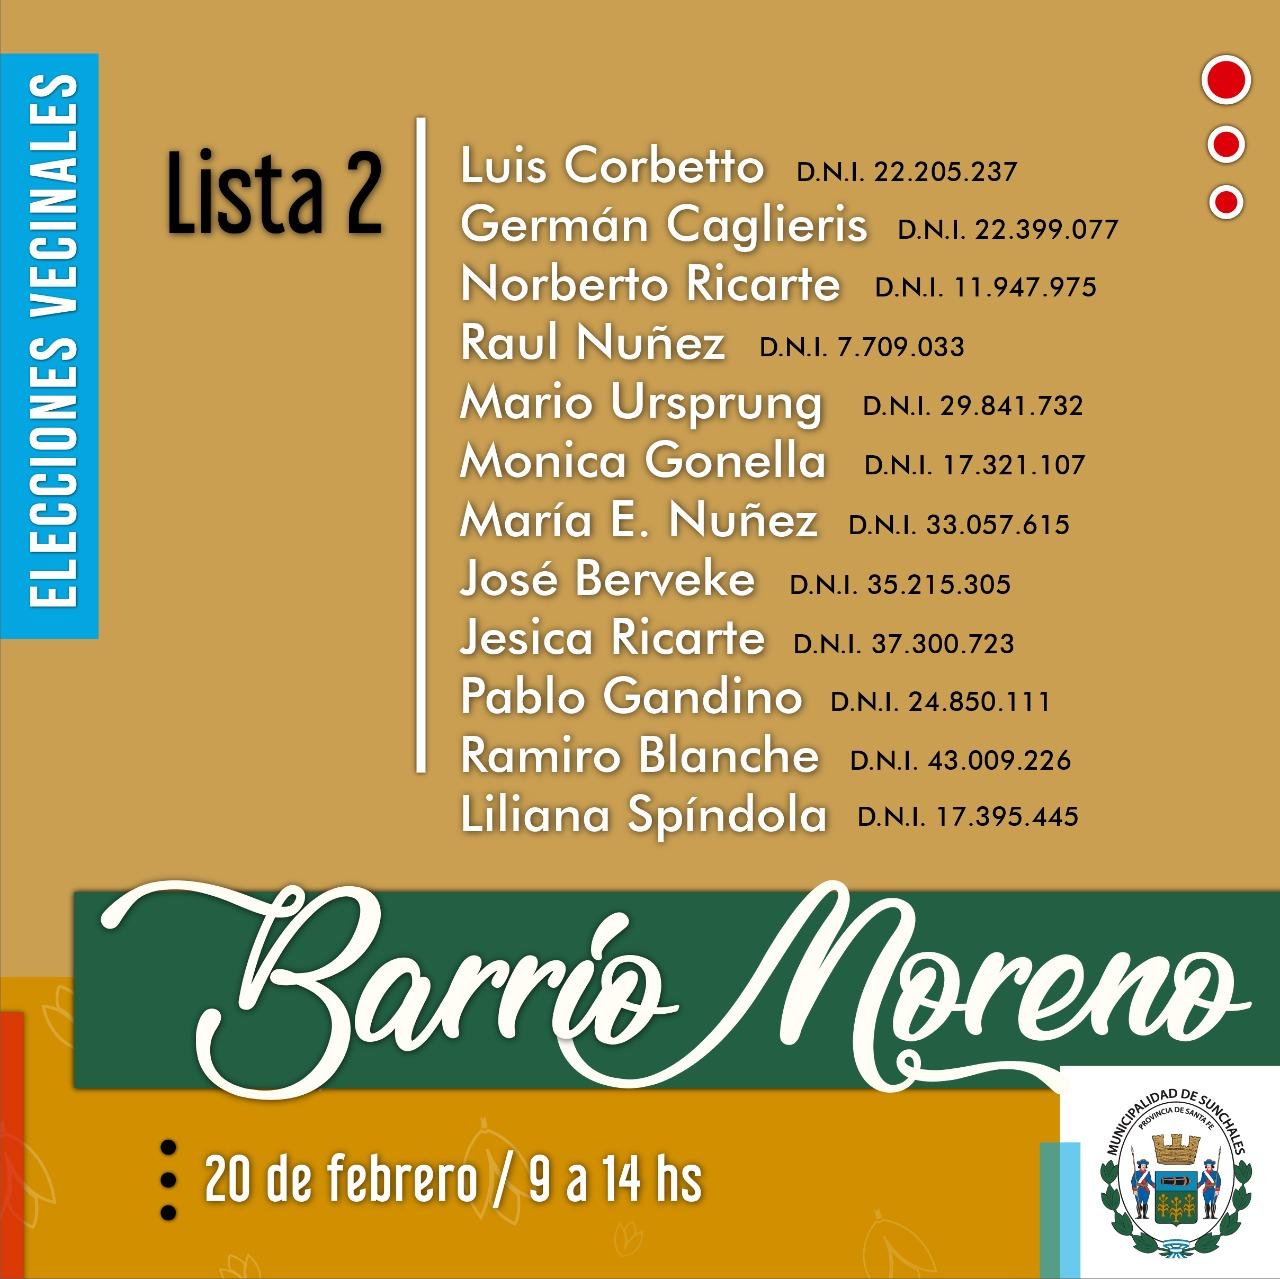 Lista 2 Moreno